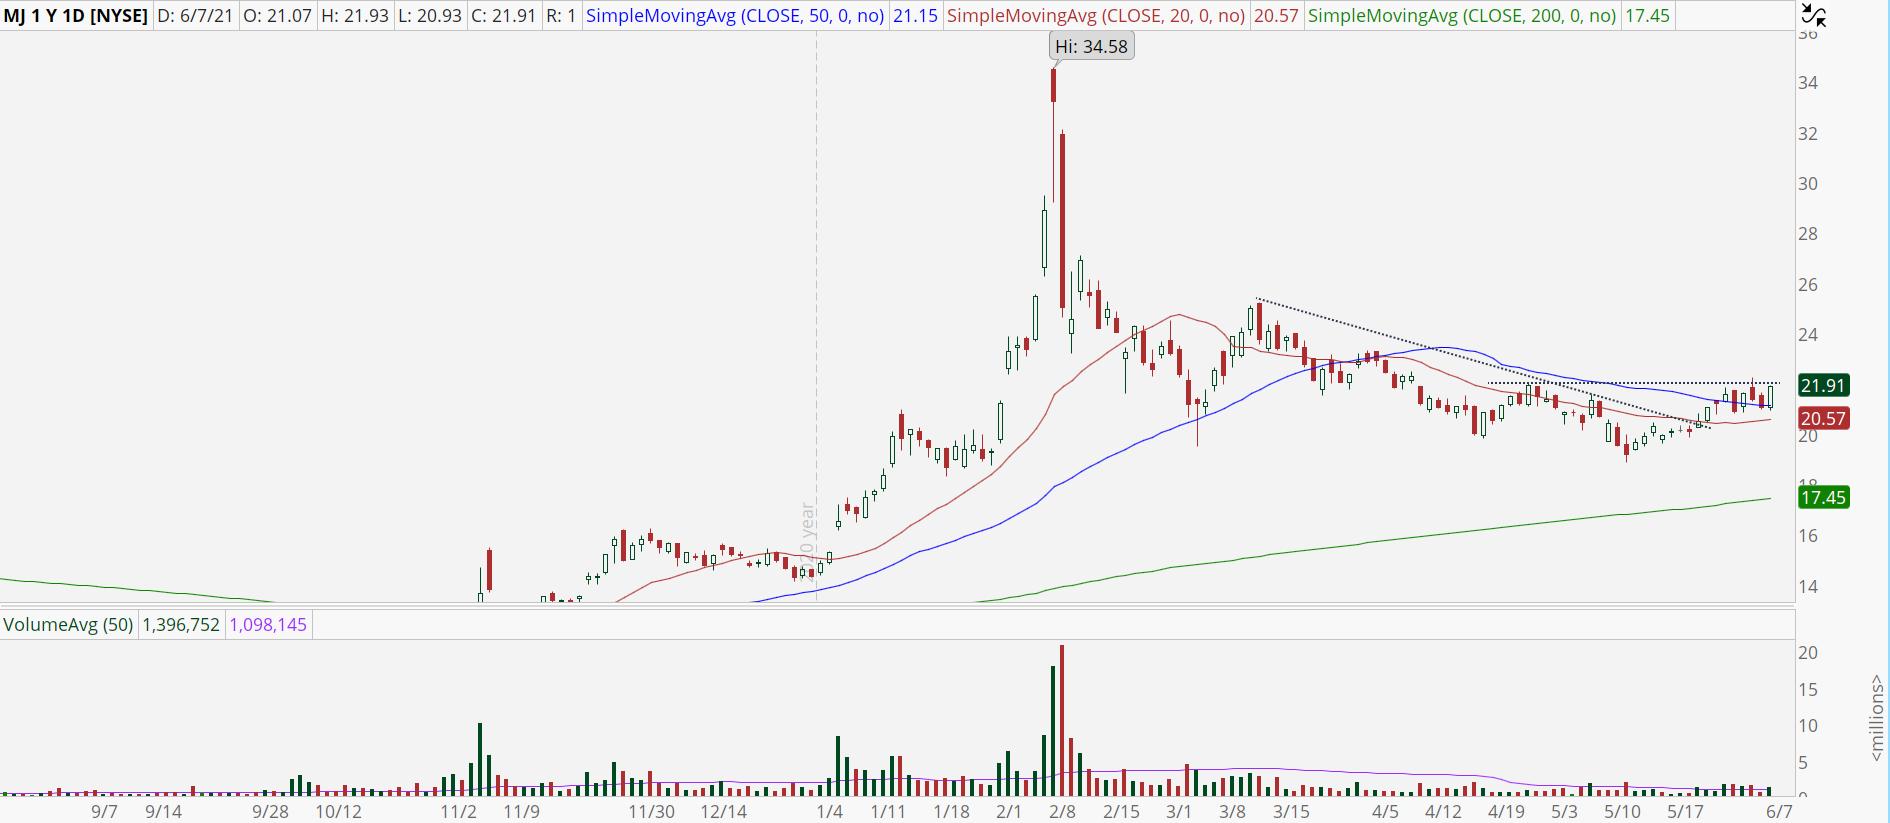 Alternative Harvest (MJ) stock chart with bullish trend reversal